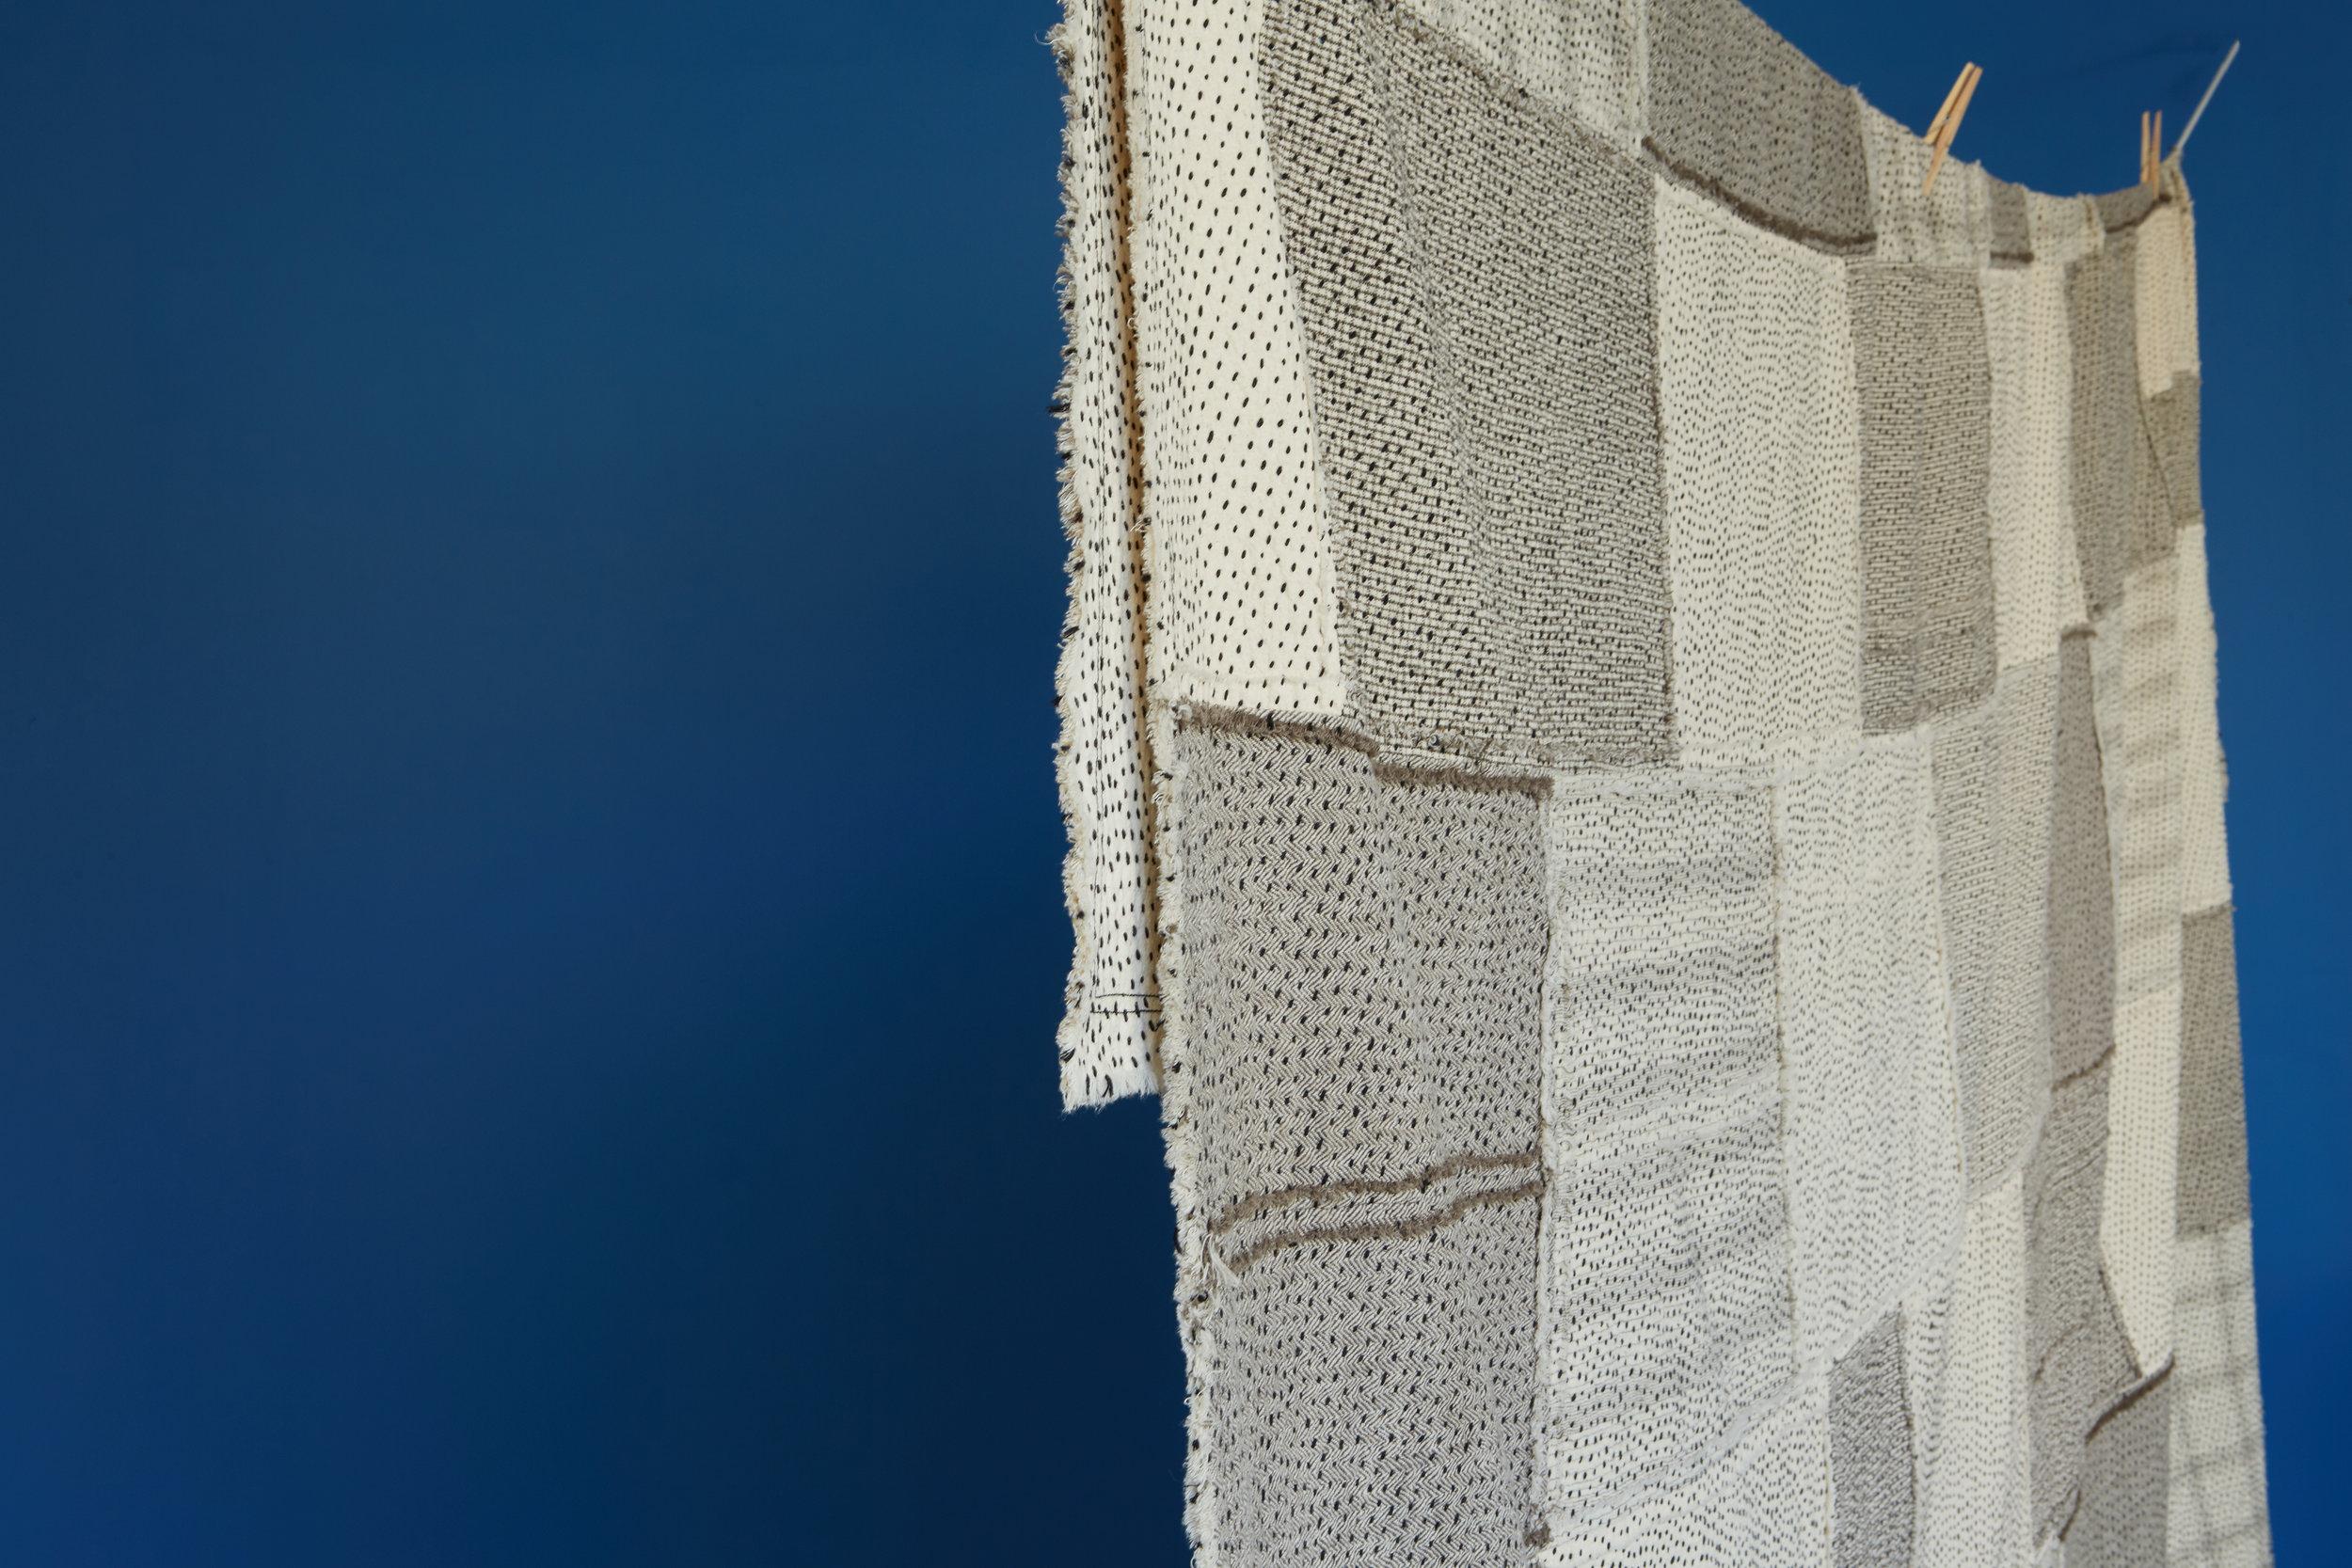 Raw Chindi Quilt in kala cotton fabrics